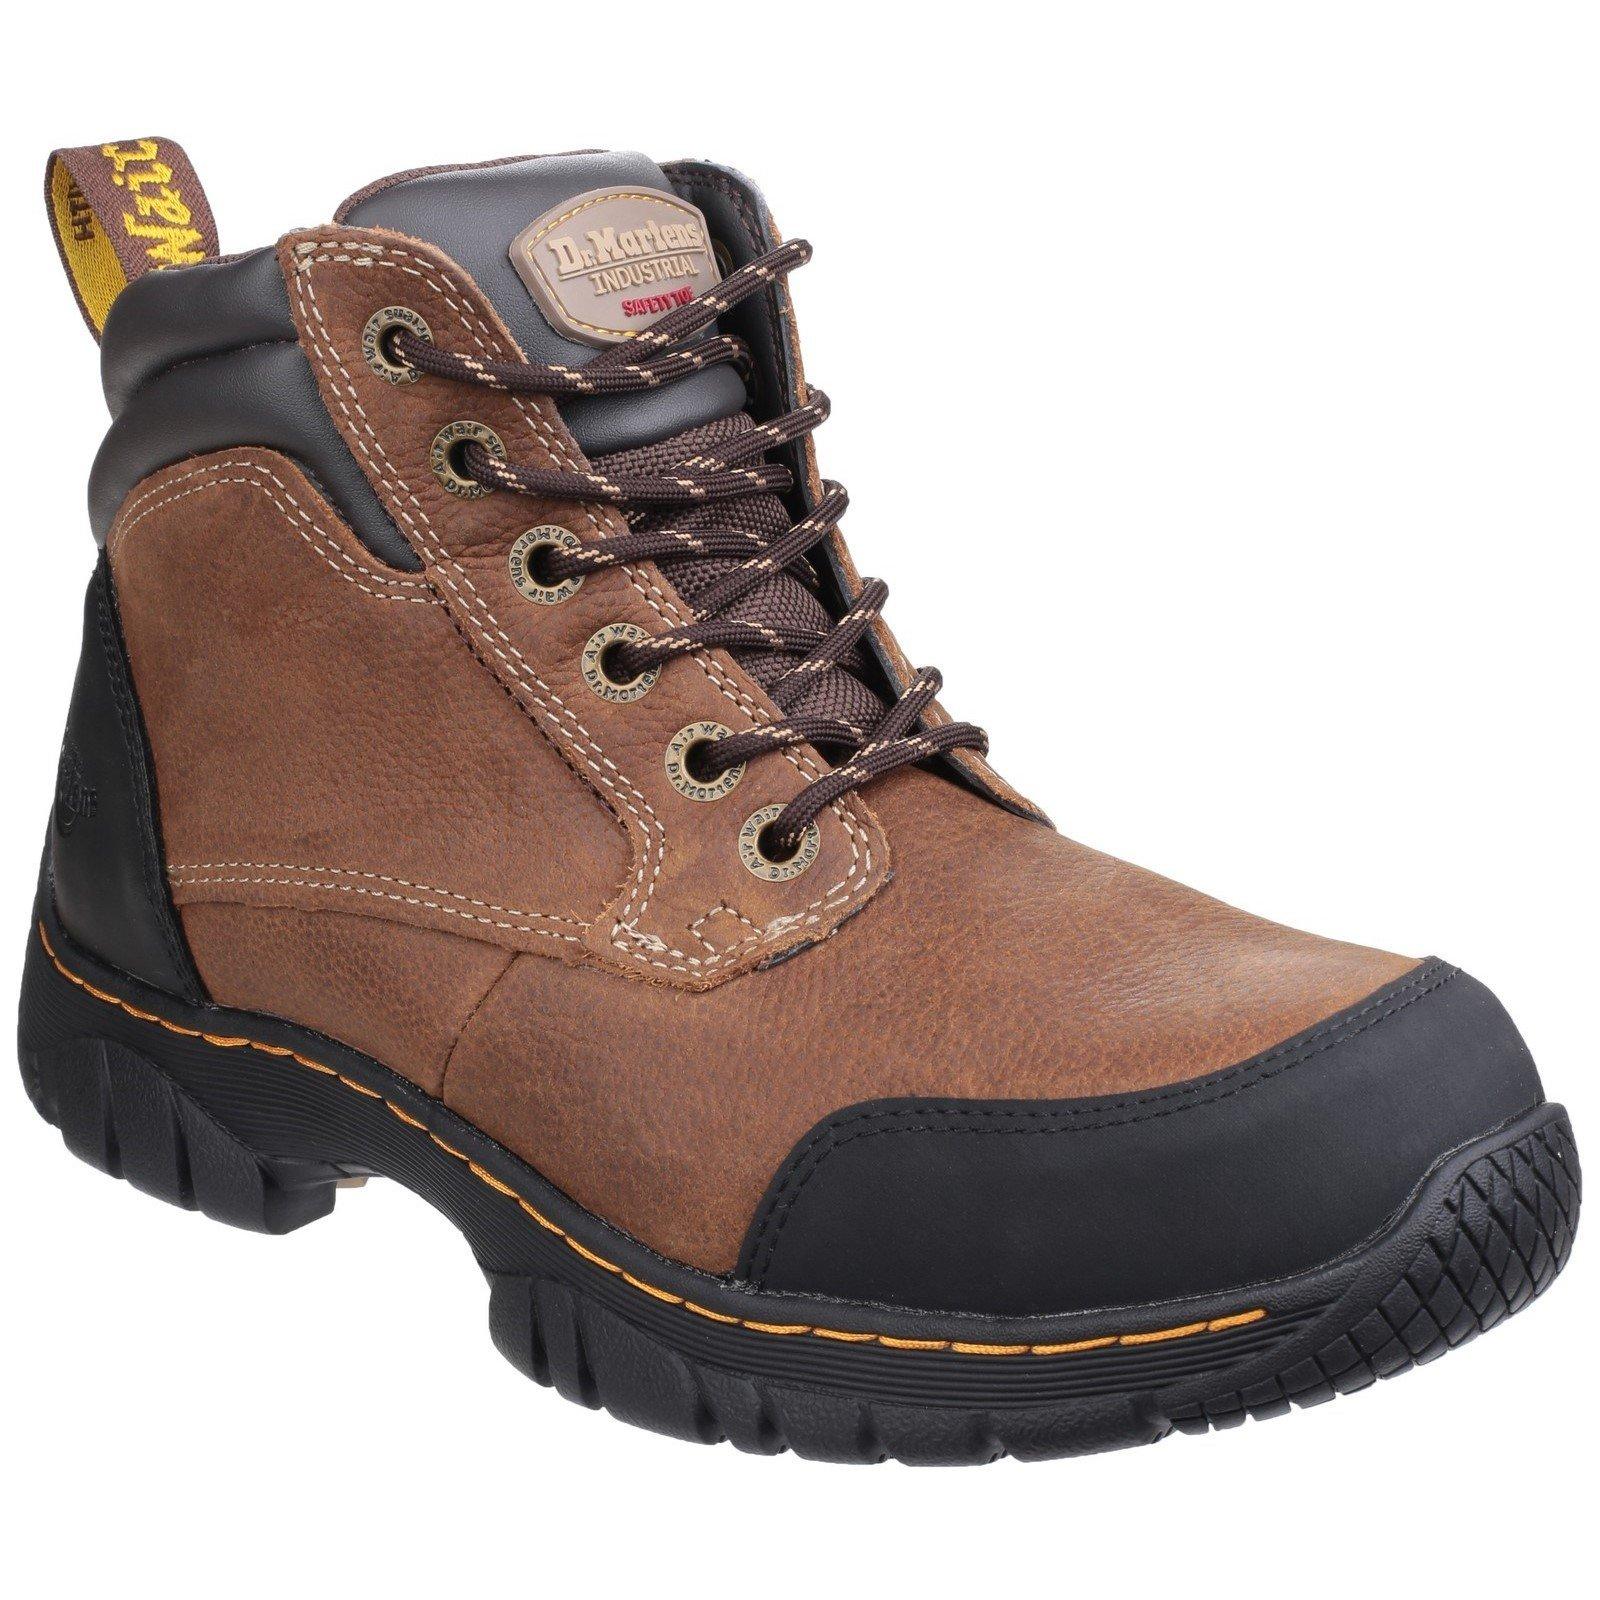 Dr Martens Unisex Riverton SB Lace up Hiker Safety Boot 24534 - Brown 6